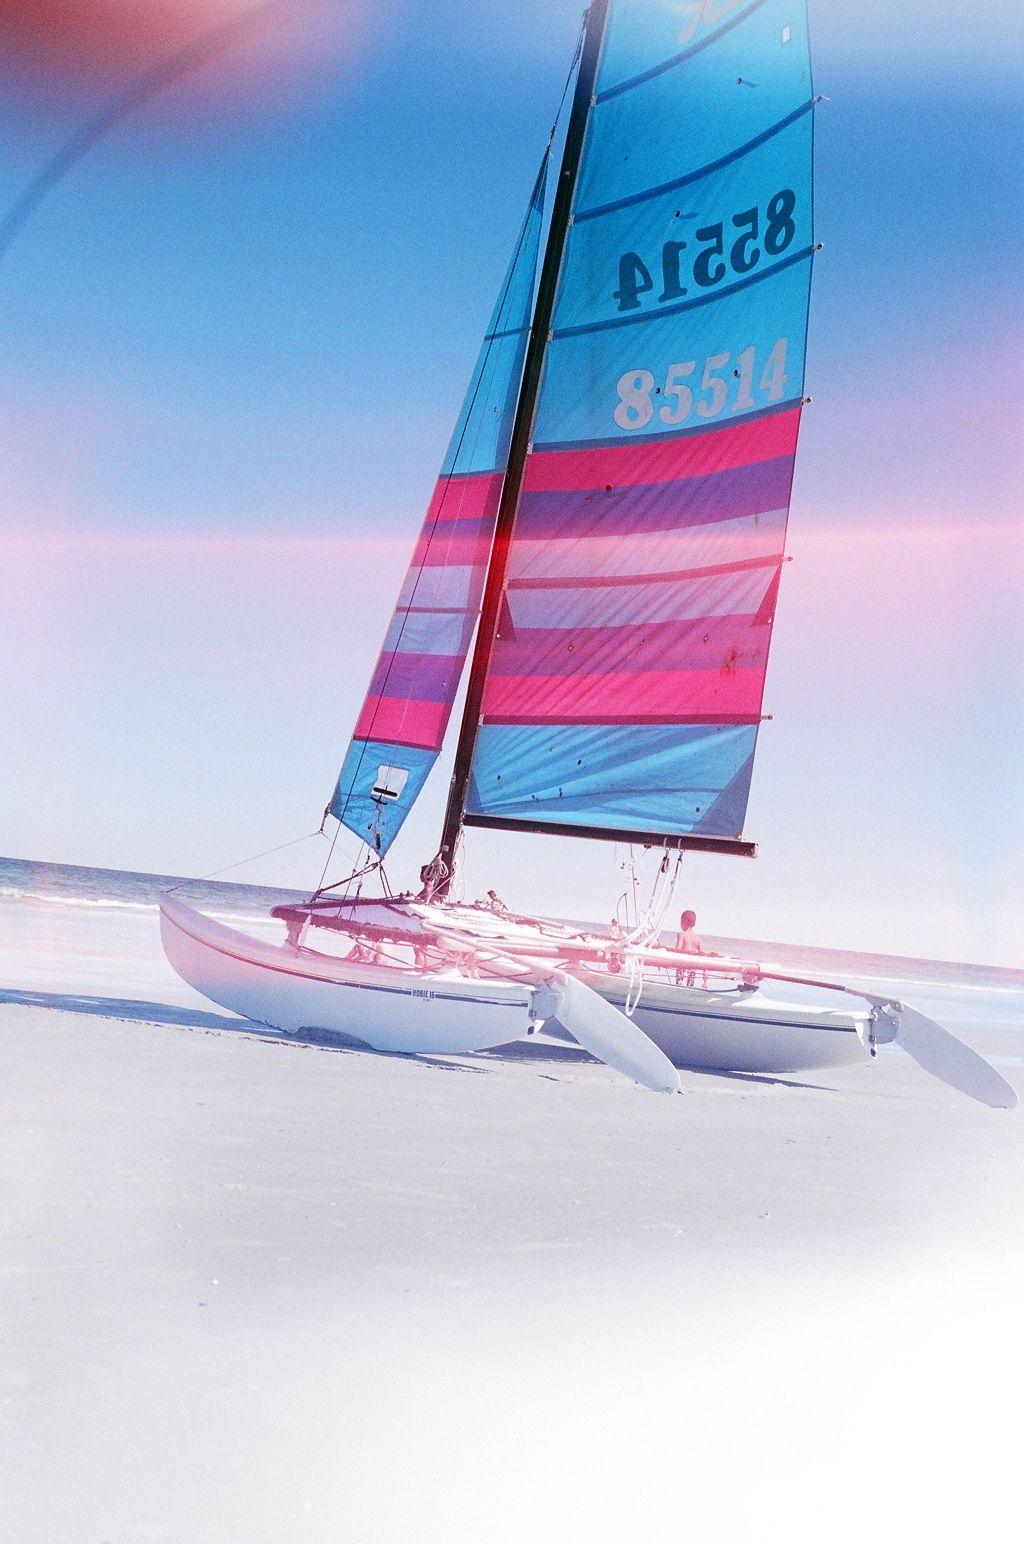 Pin by Marisa Eley on film favorites Sailing dinghy